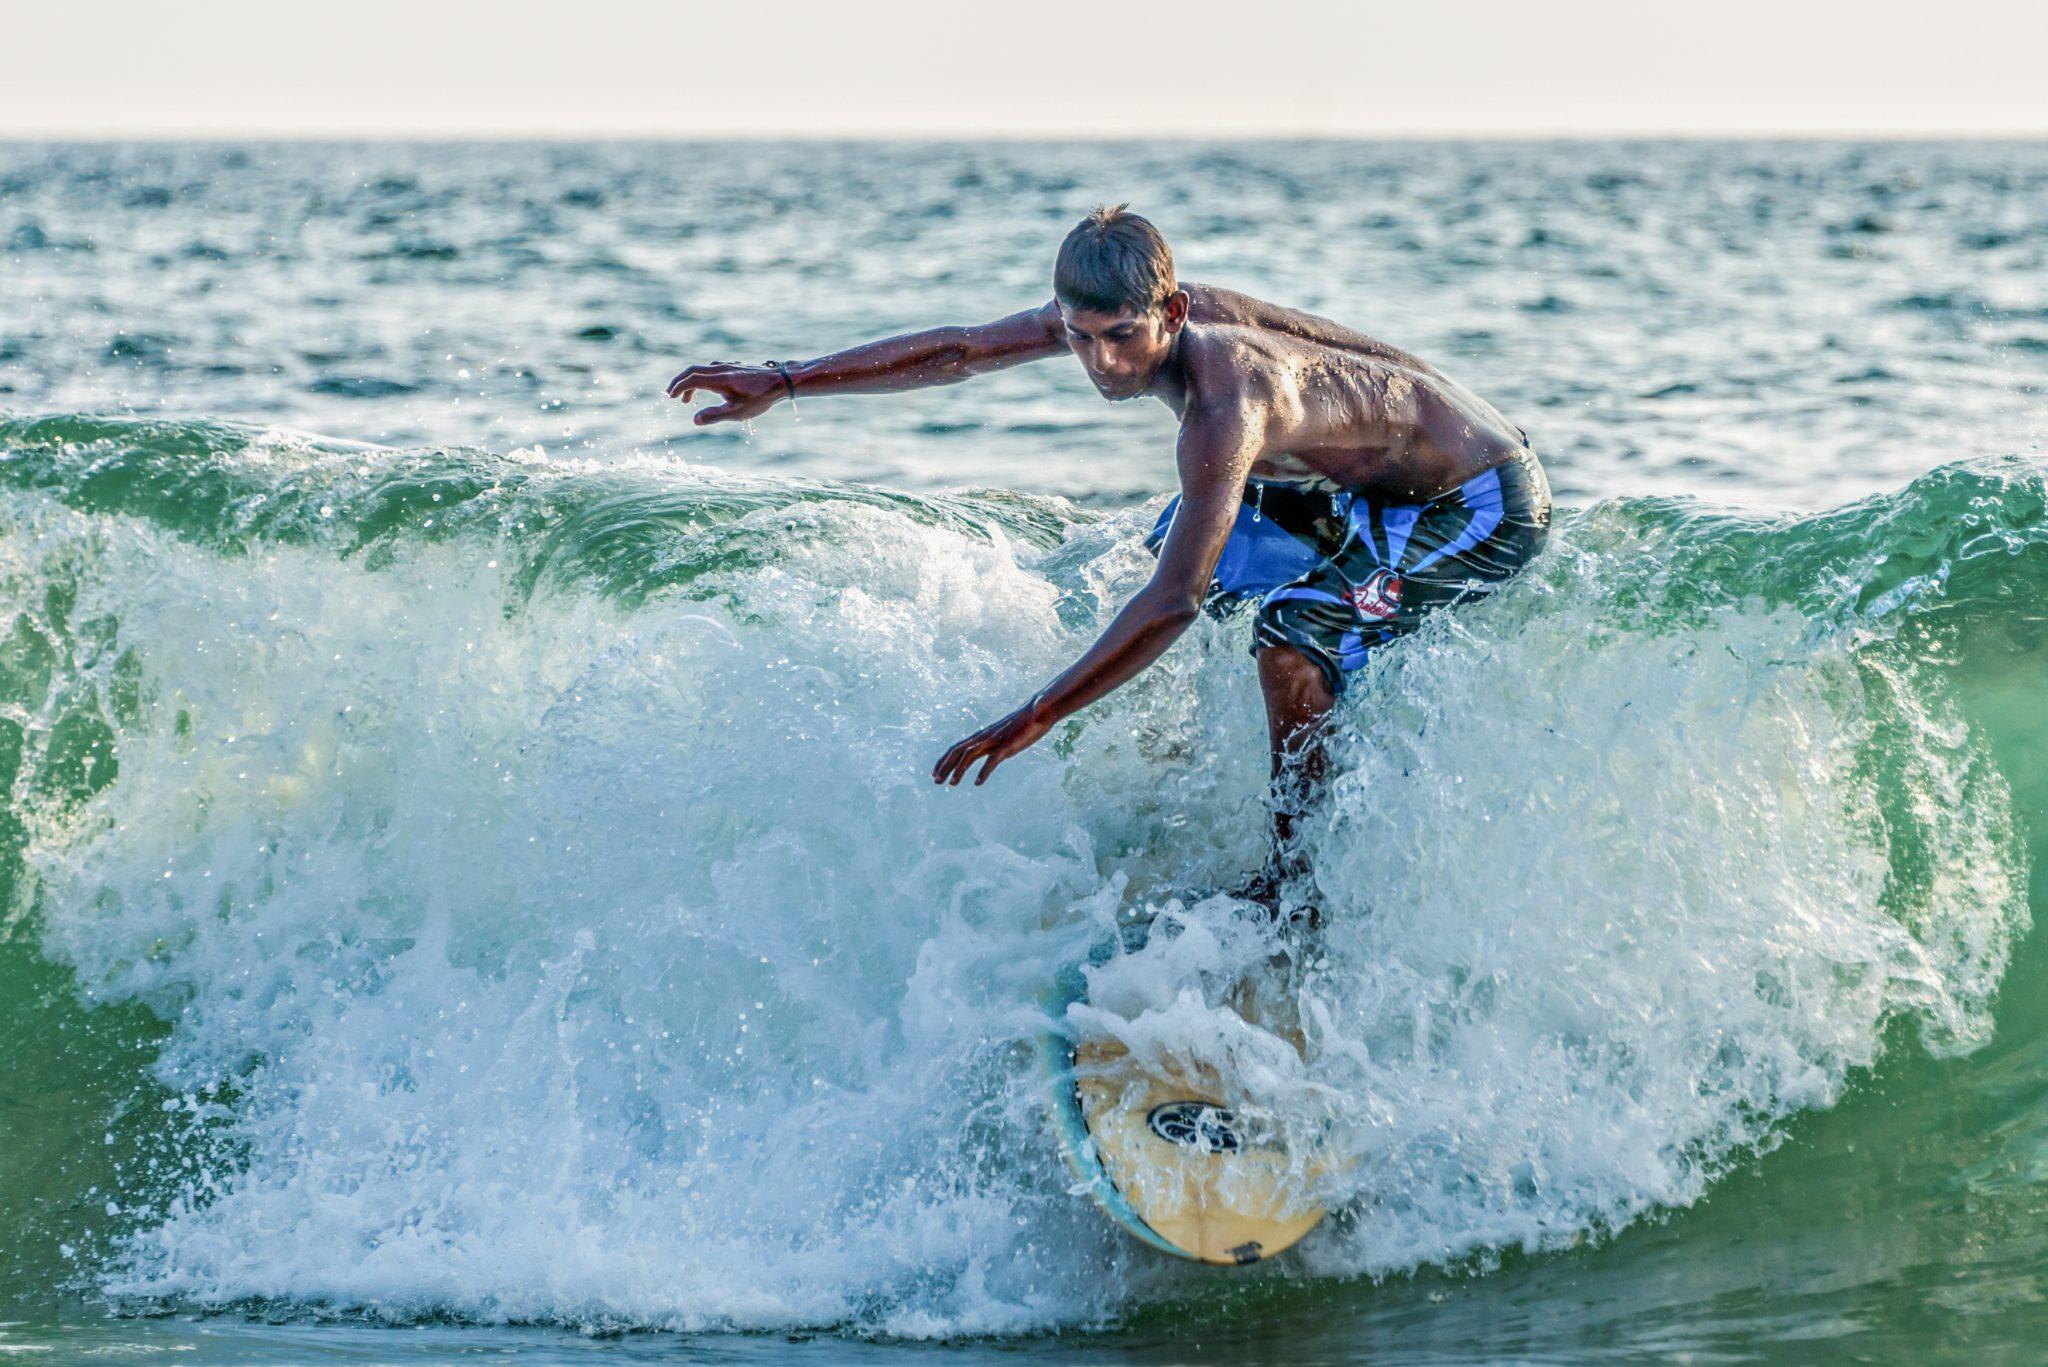 Surfer in Kovalam Beach, Kerala / India / Travel Photography / Street Photography / Matthieu Waddell Photo / Professional Photographer